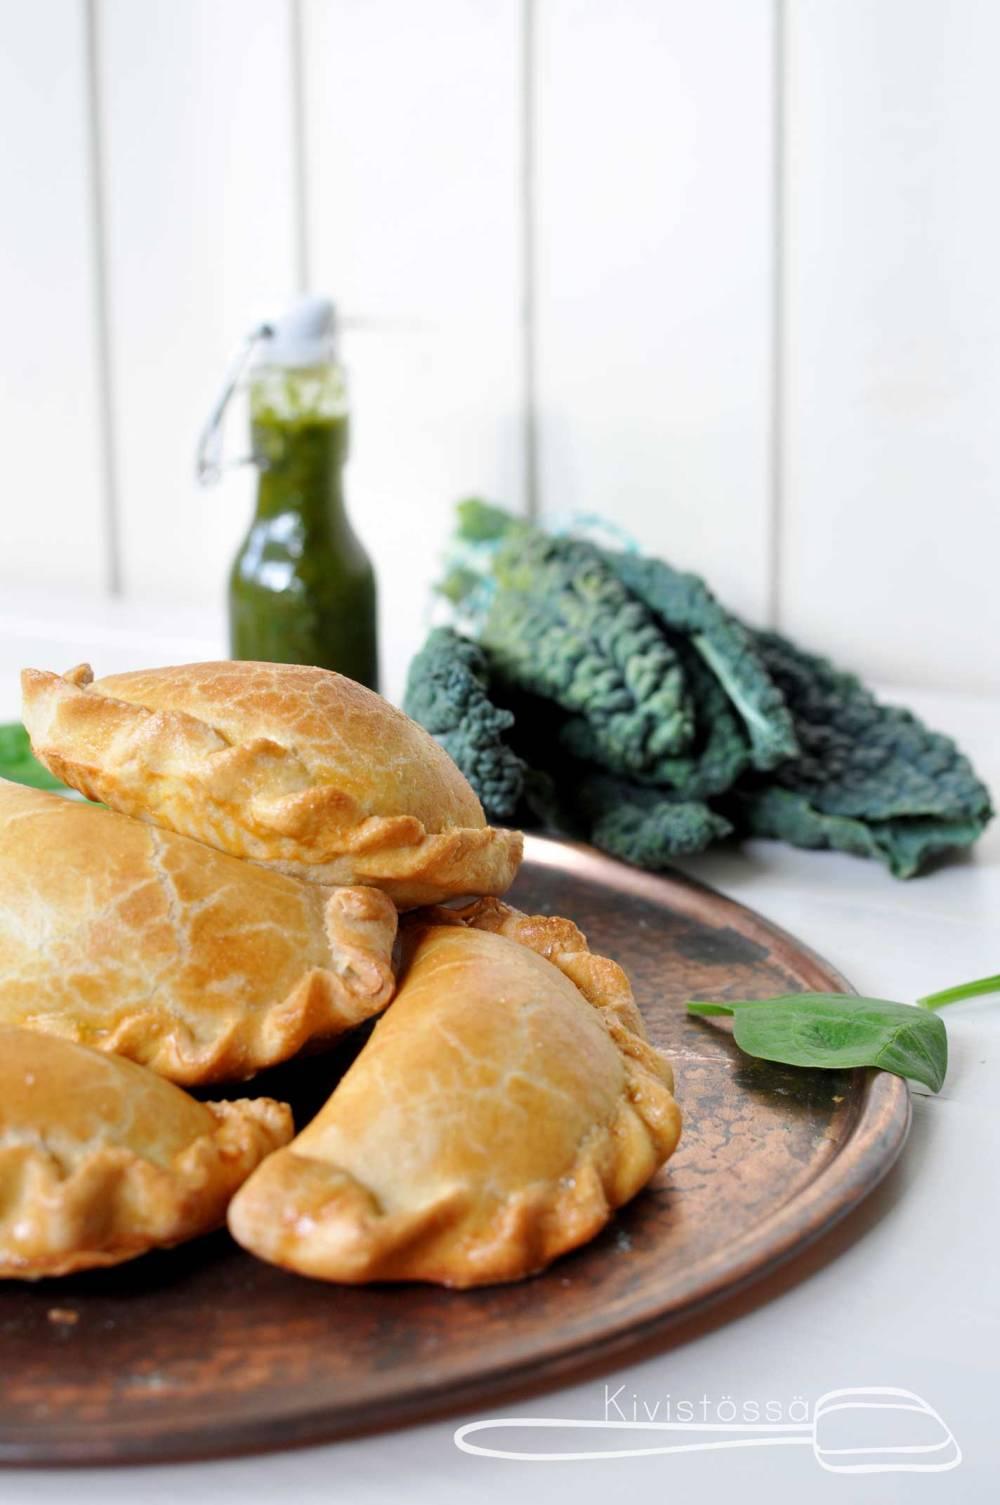 Empanadas with cavolo nero filling - Kivistössä Foodblog. www.kivistossa.com #cavolonero #goatscheese #empanadas